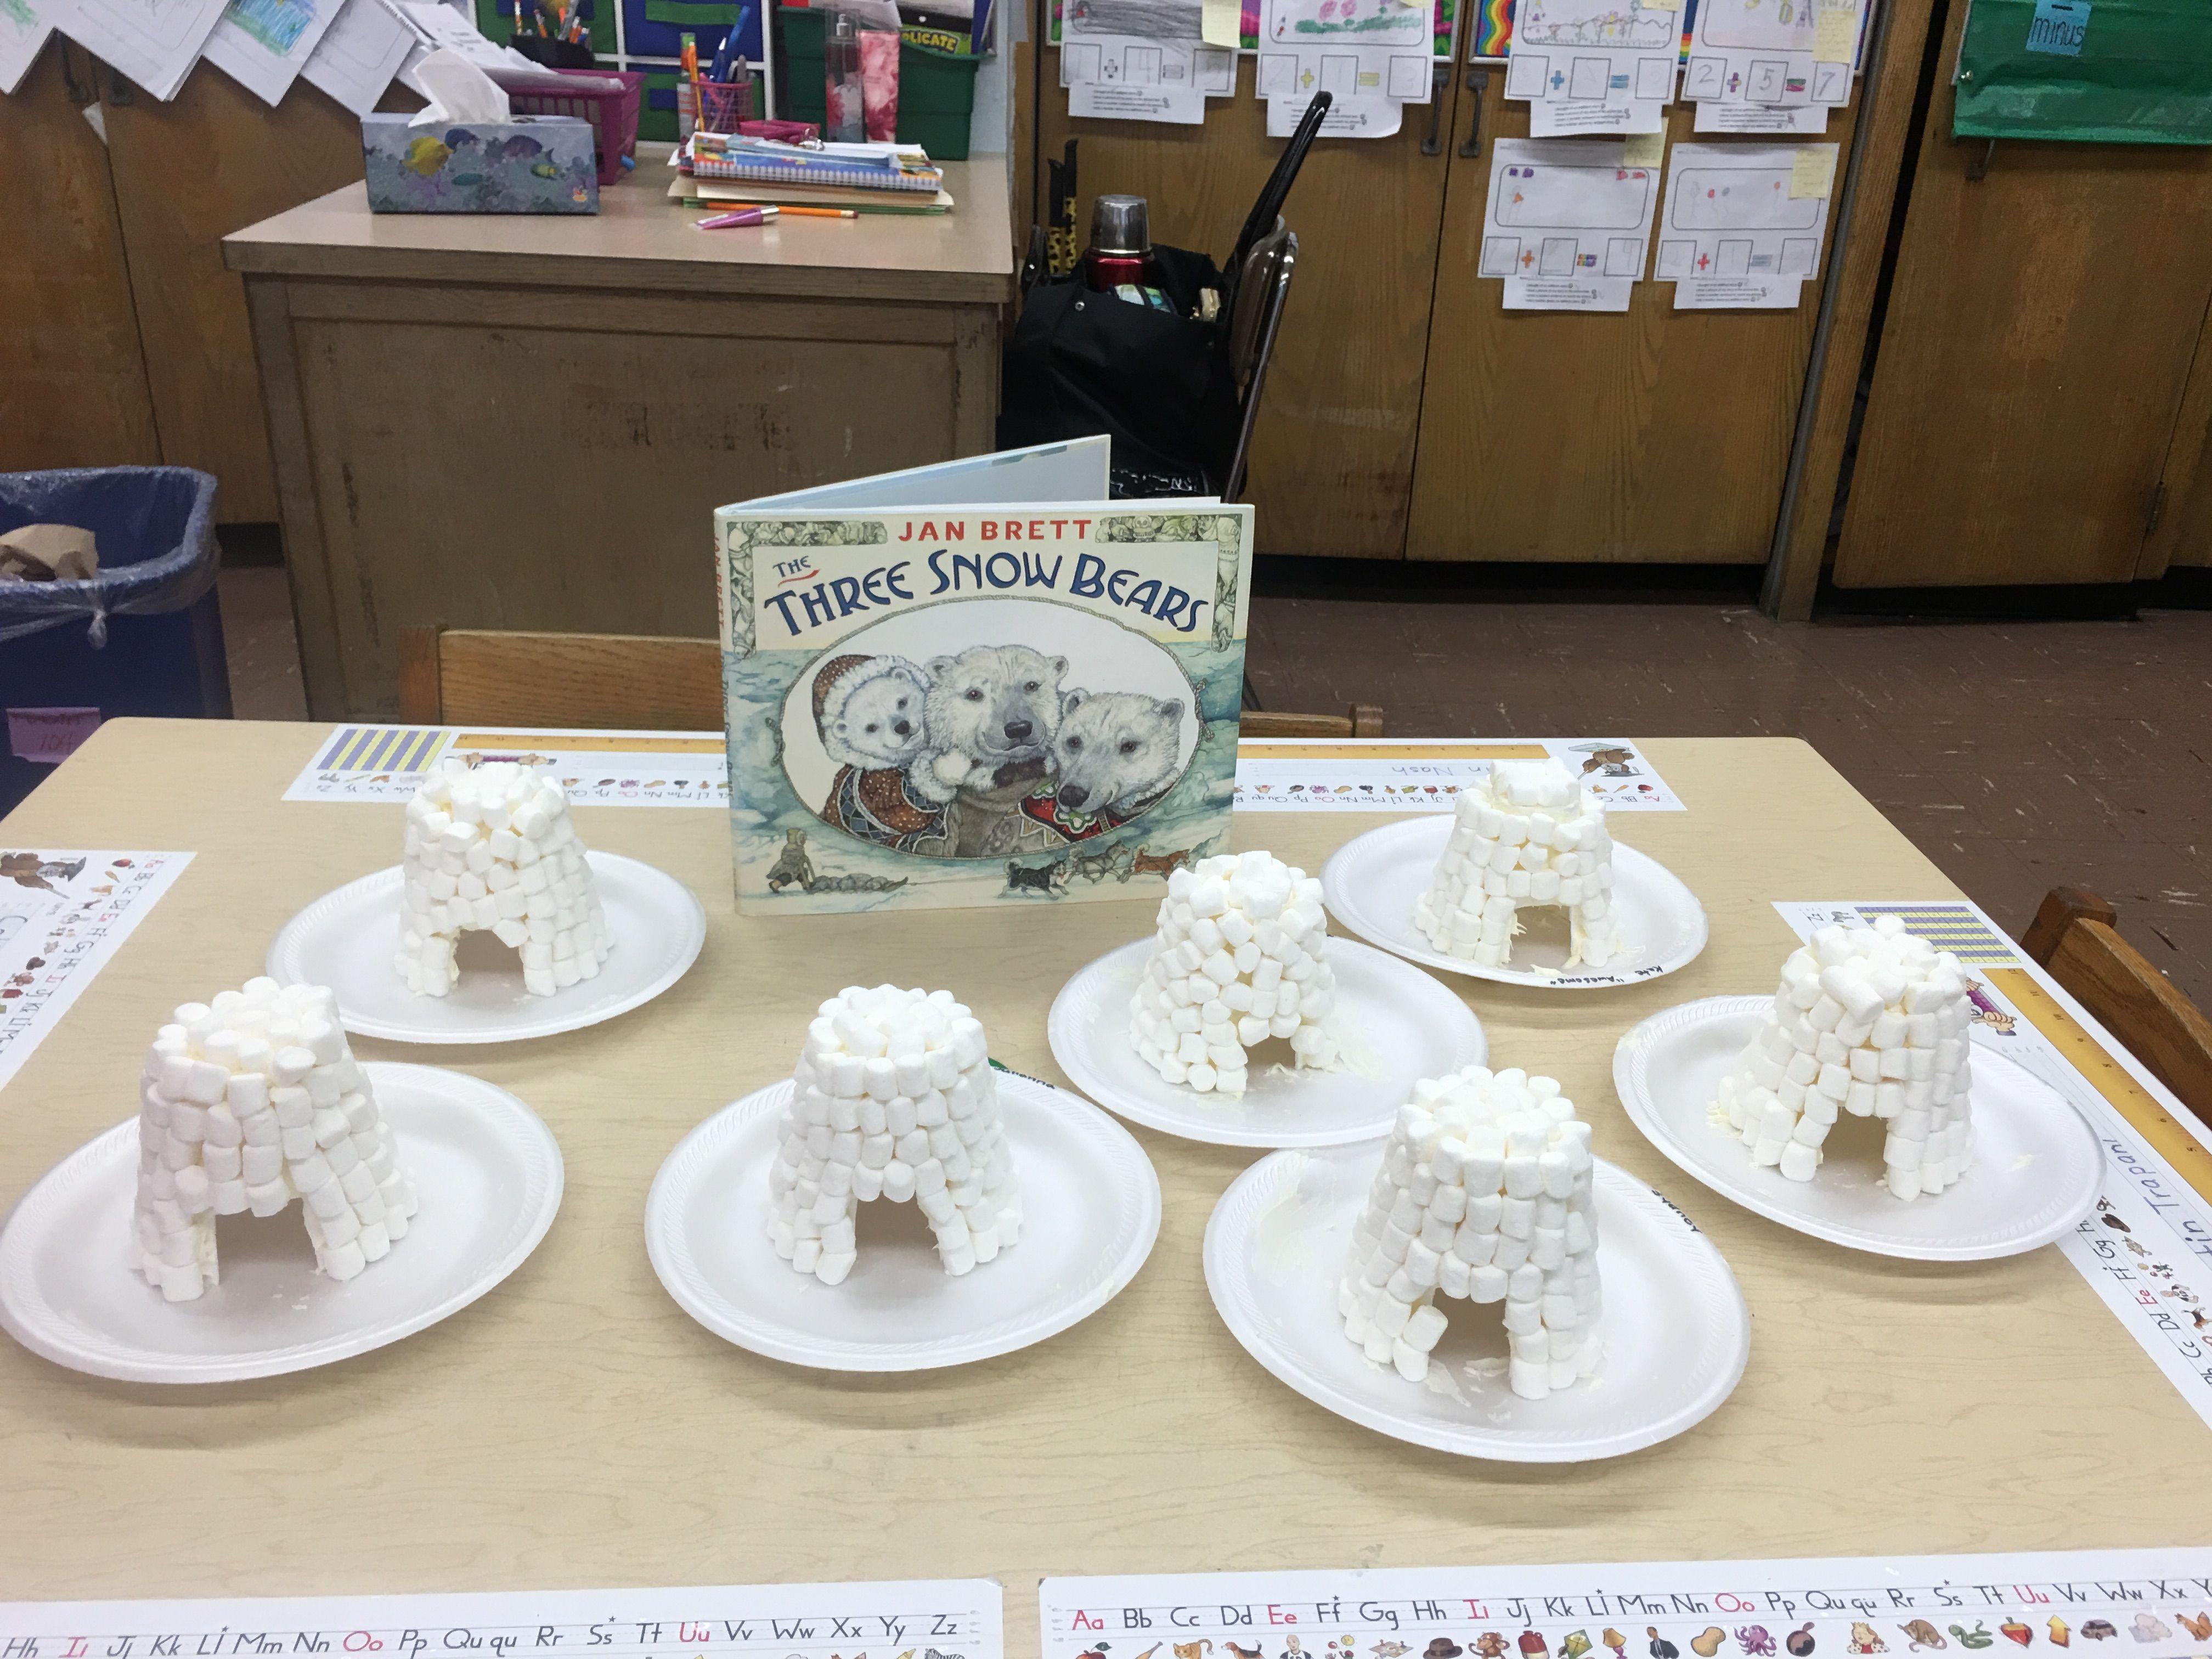 We Read The Three Snow Bears By Jan Brett And Created